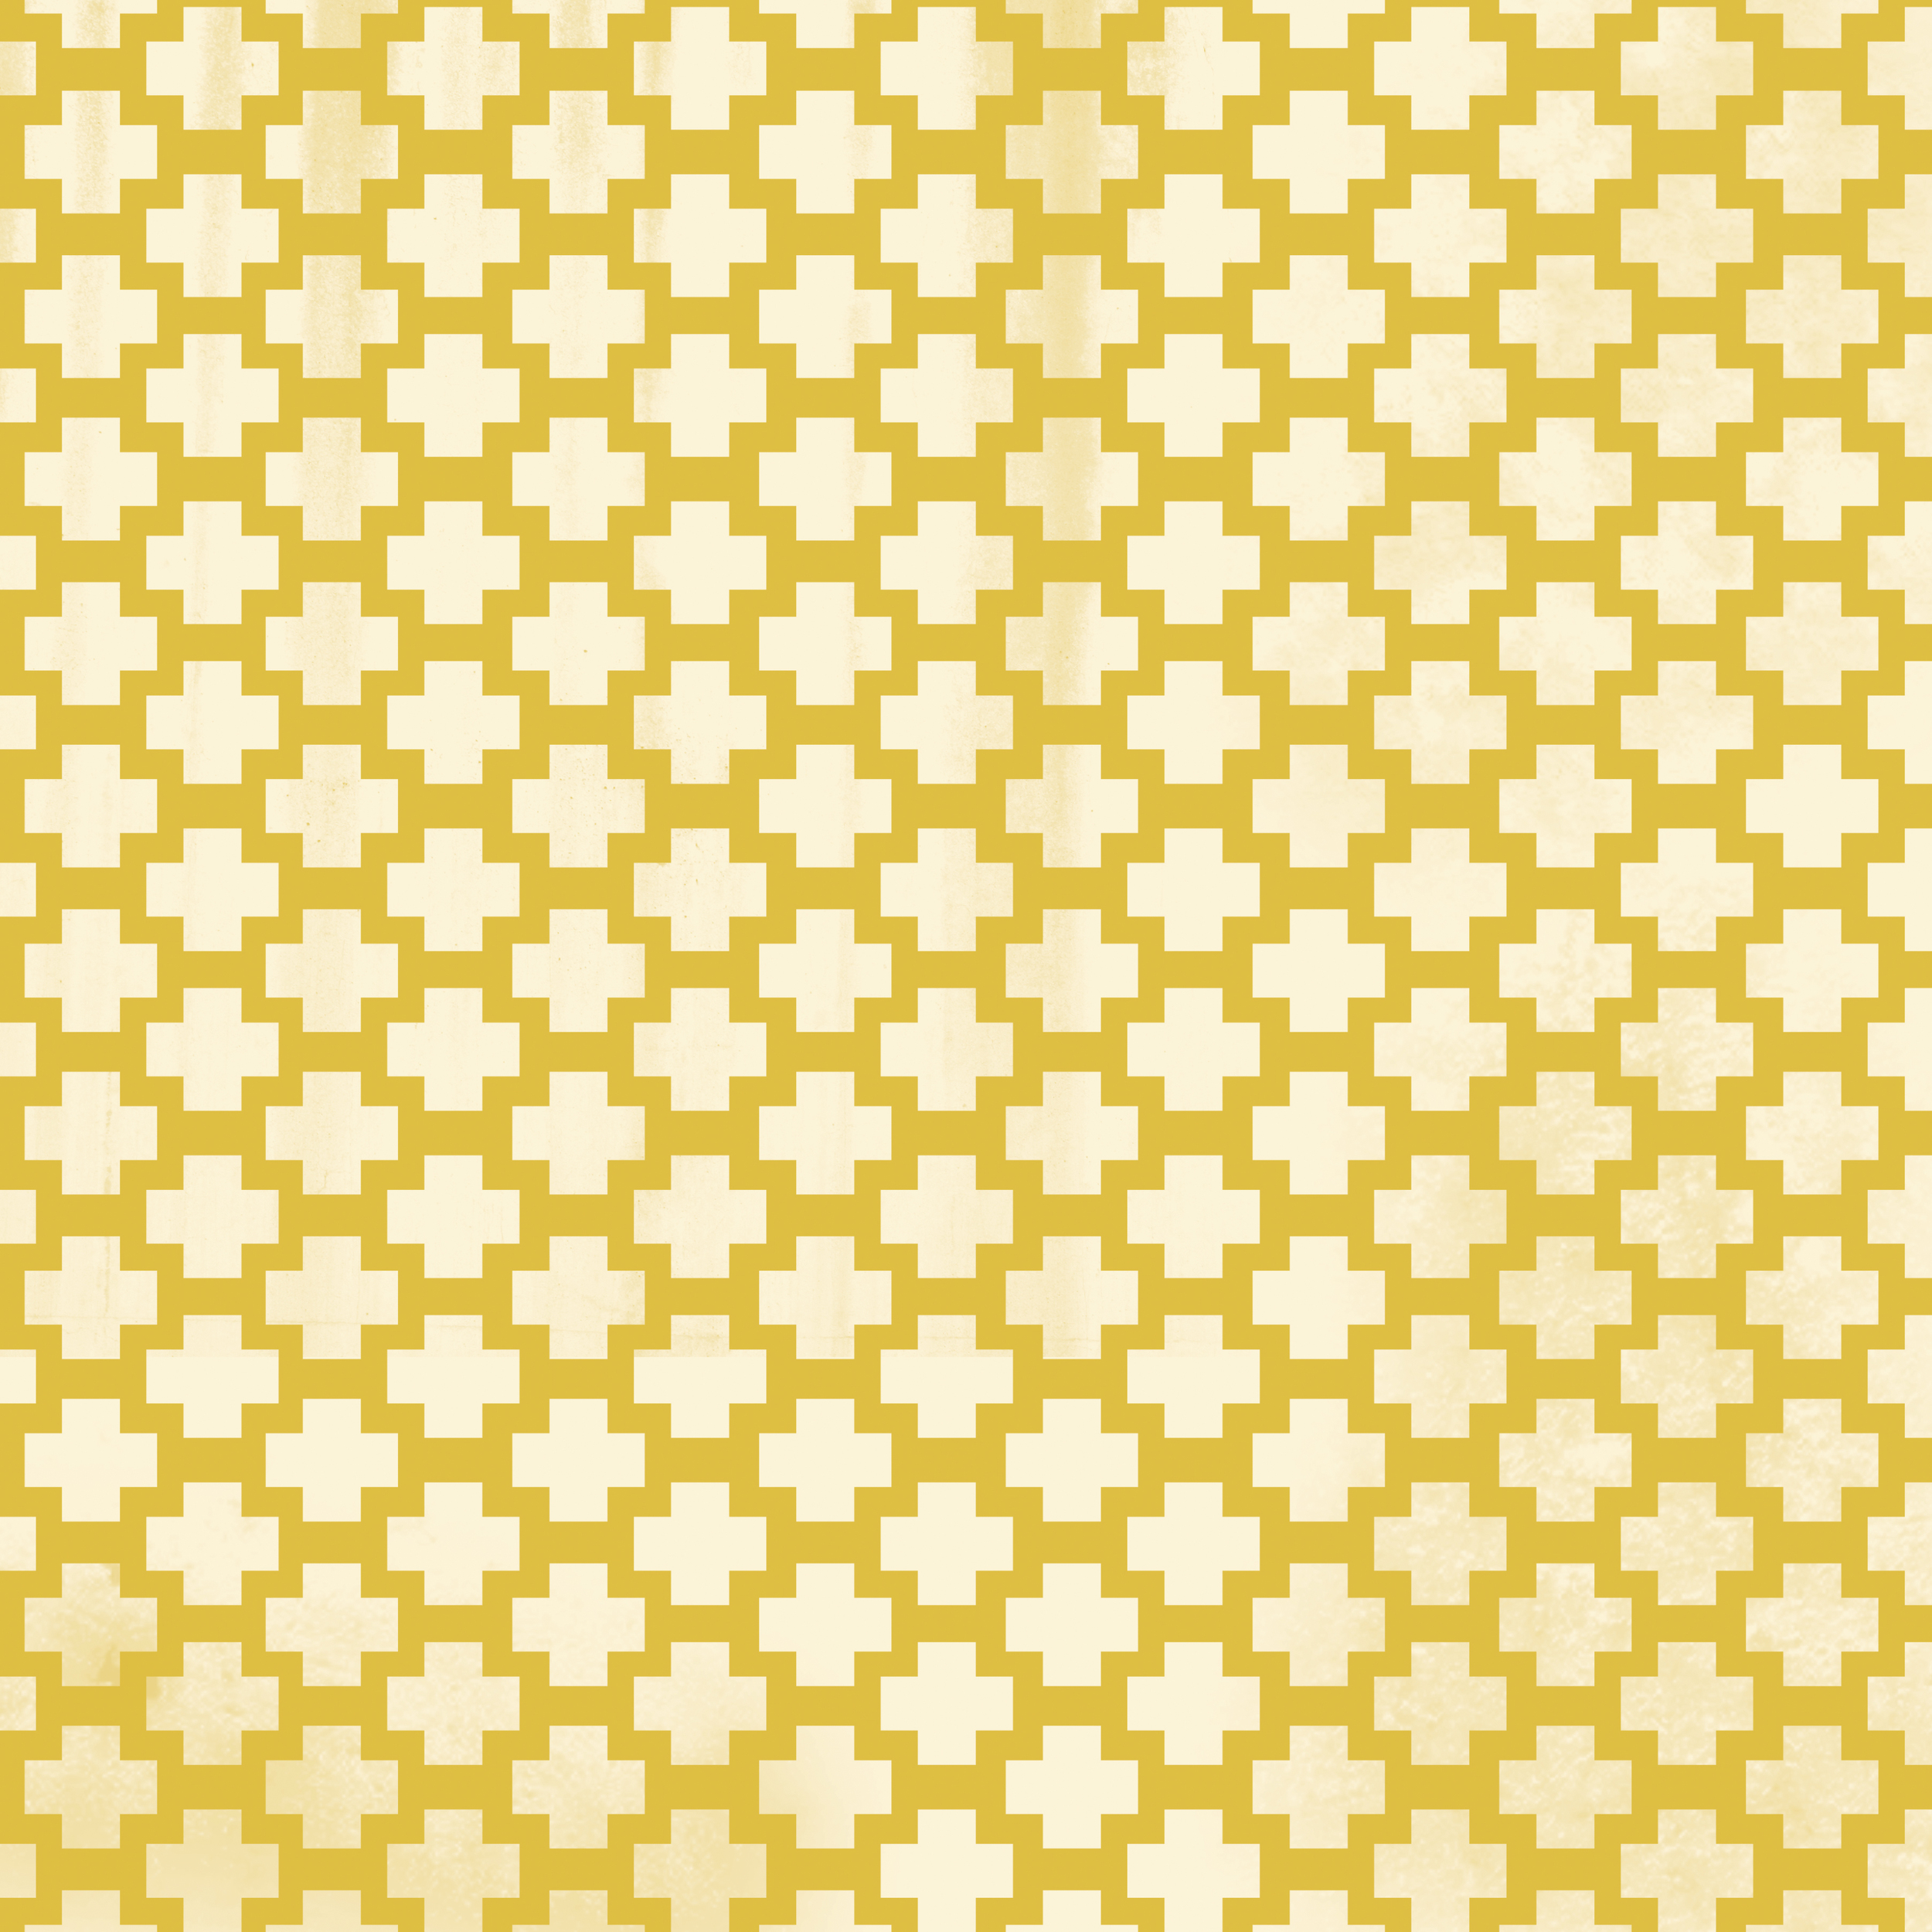 yellow filligree